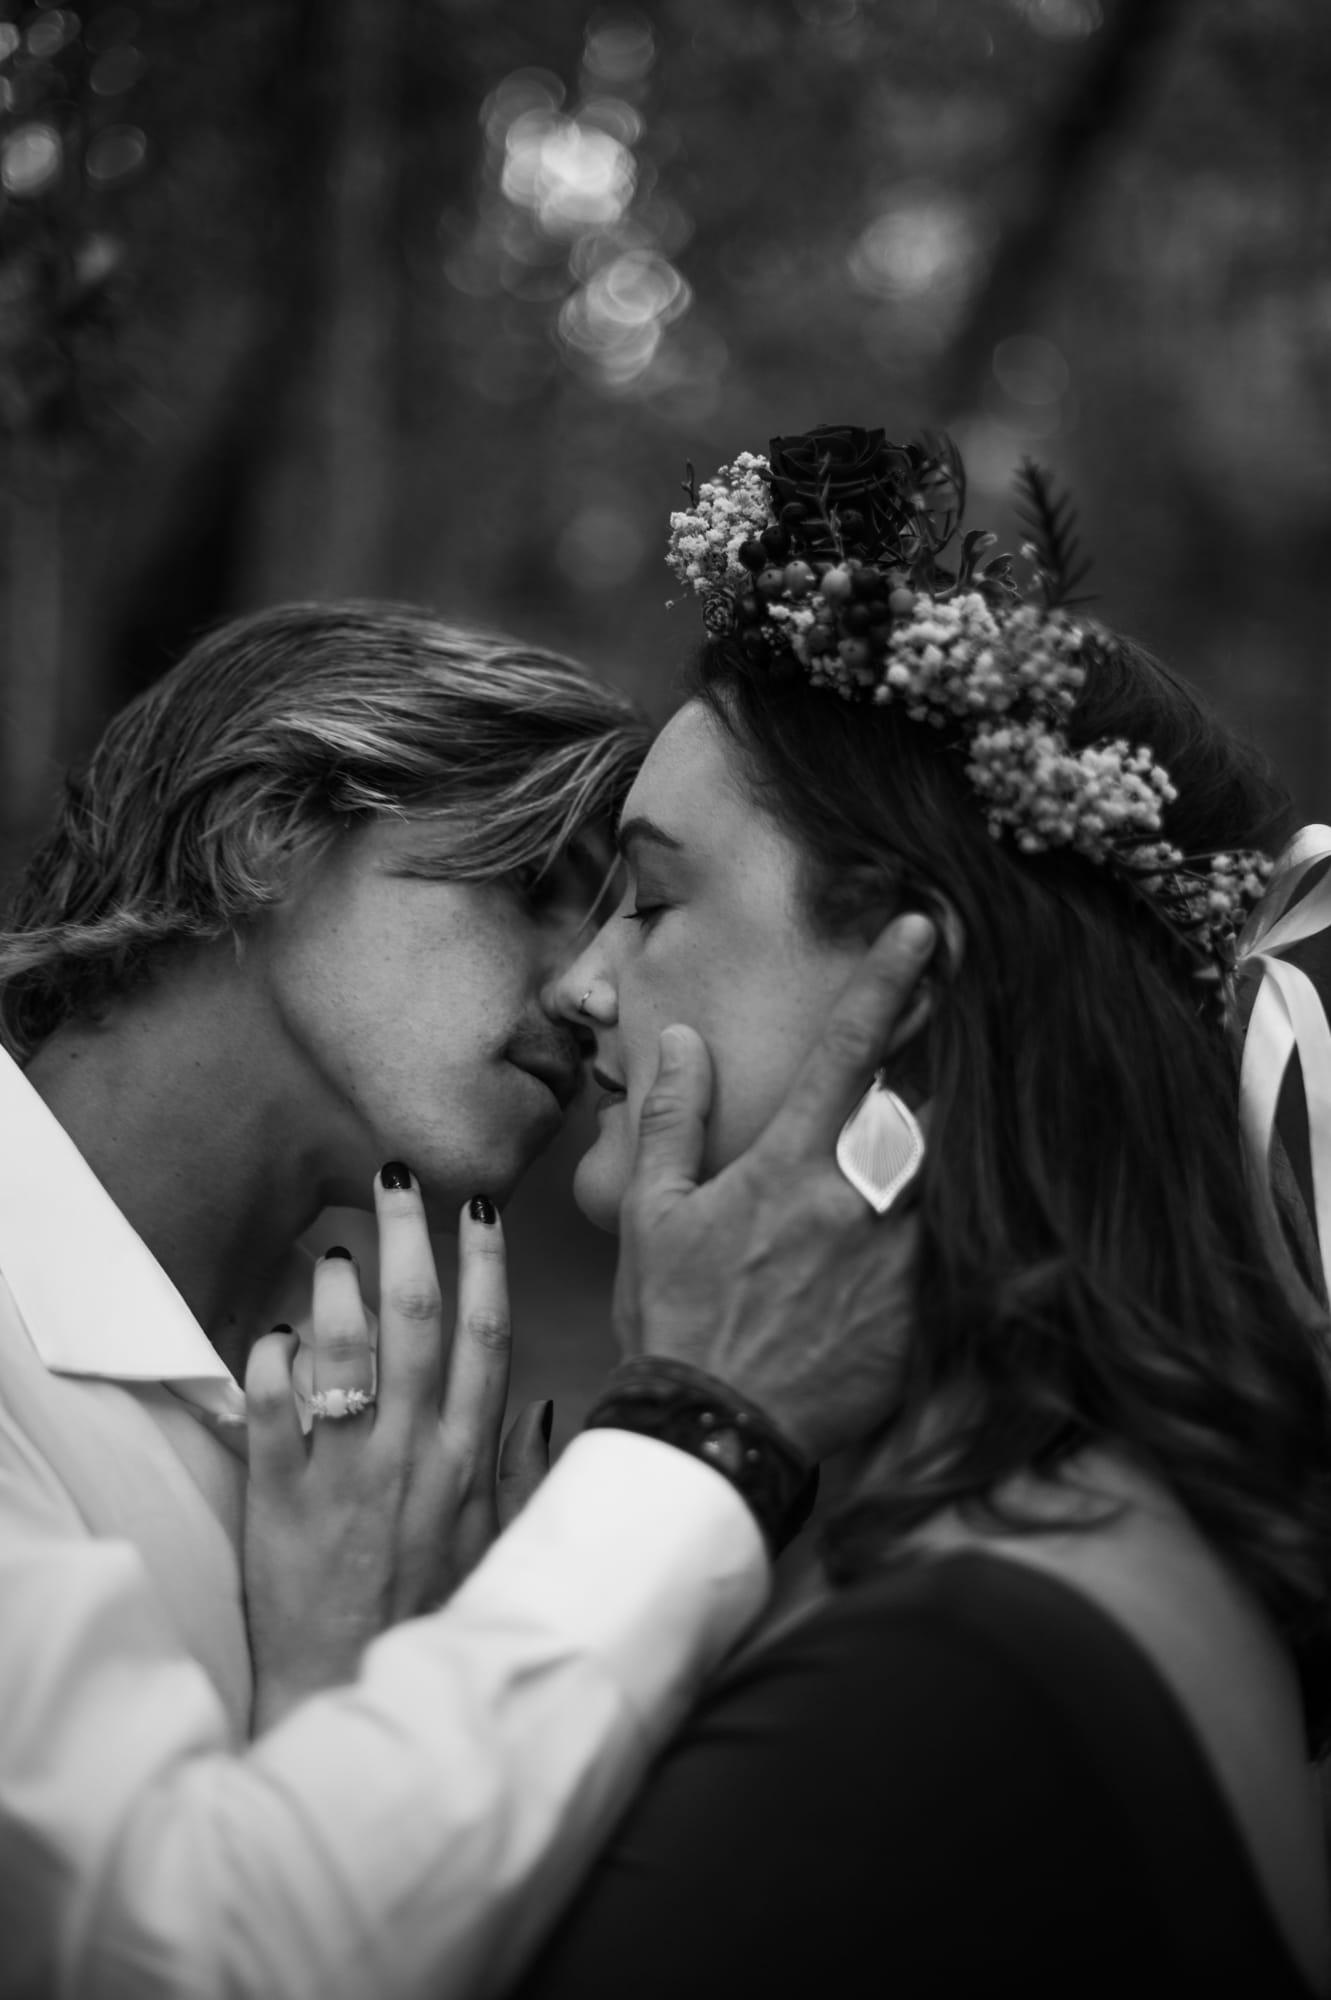 wesley-lanie-george-fernridge-engagement-June-Richards-Photography-Destination-Weddings-Elopements-Garden-Route-37